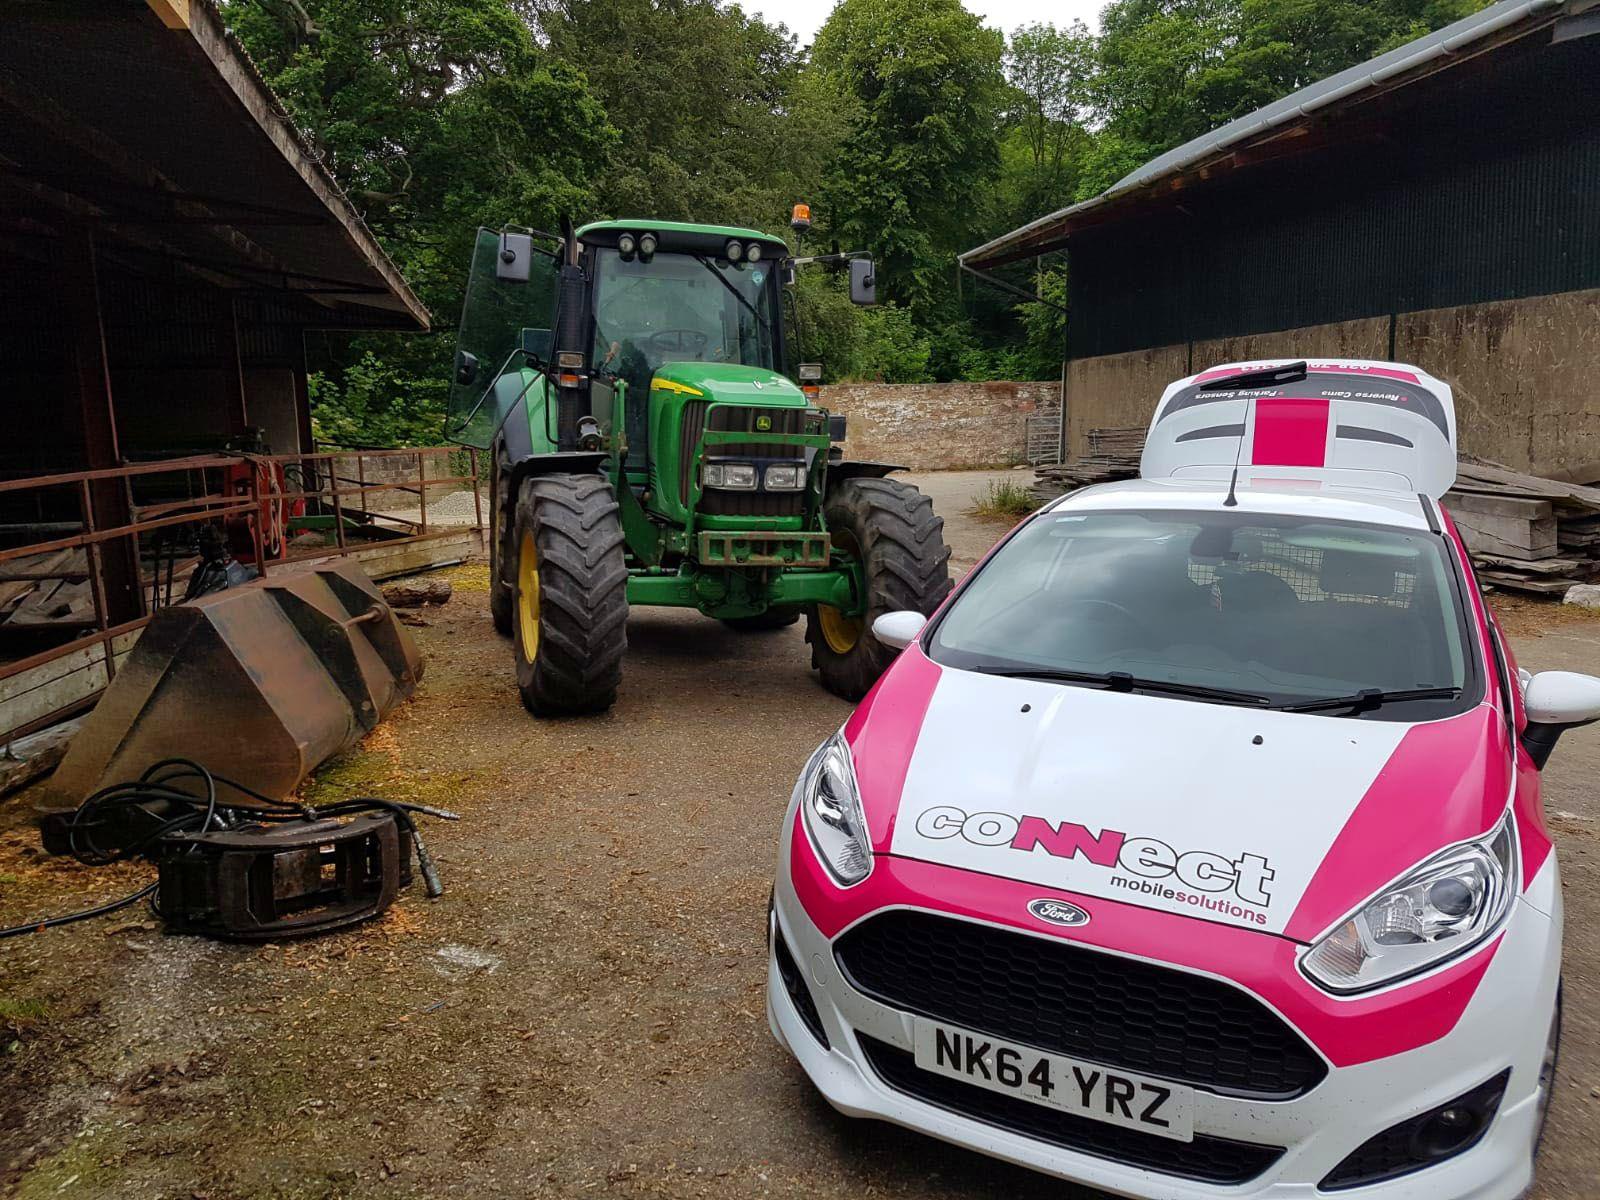 John Deer Tractor before installing new stereo